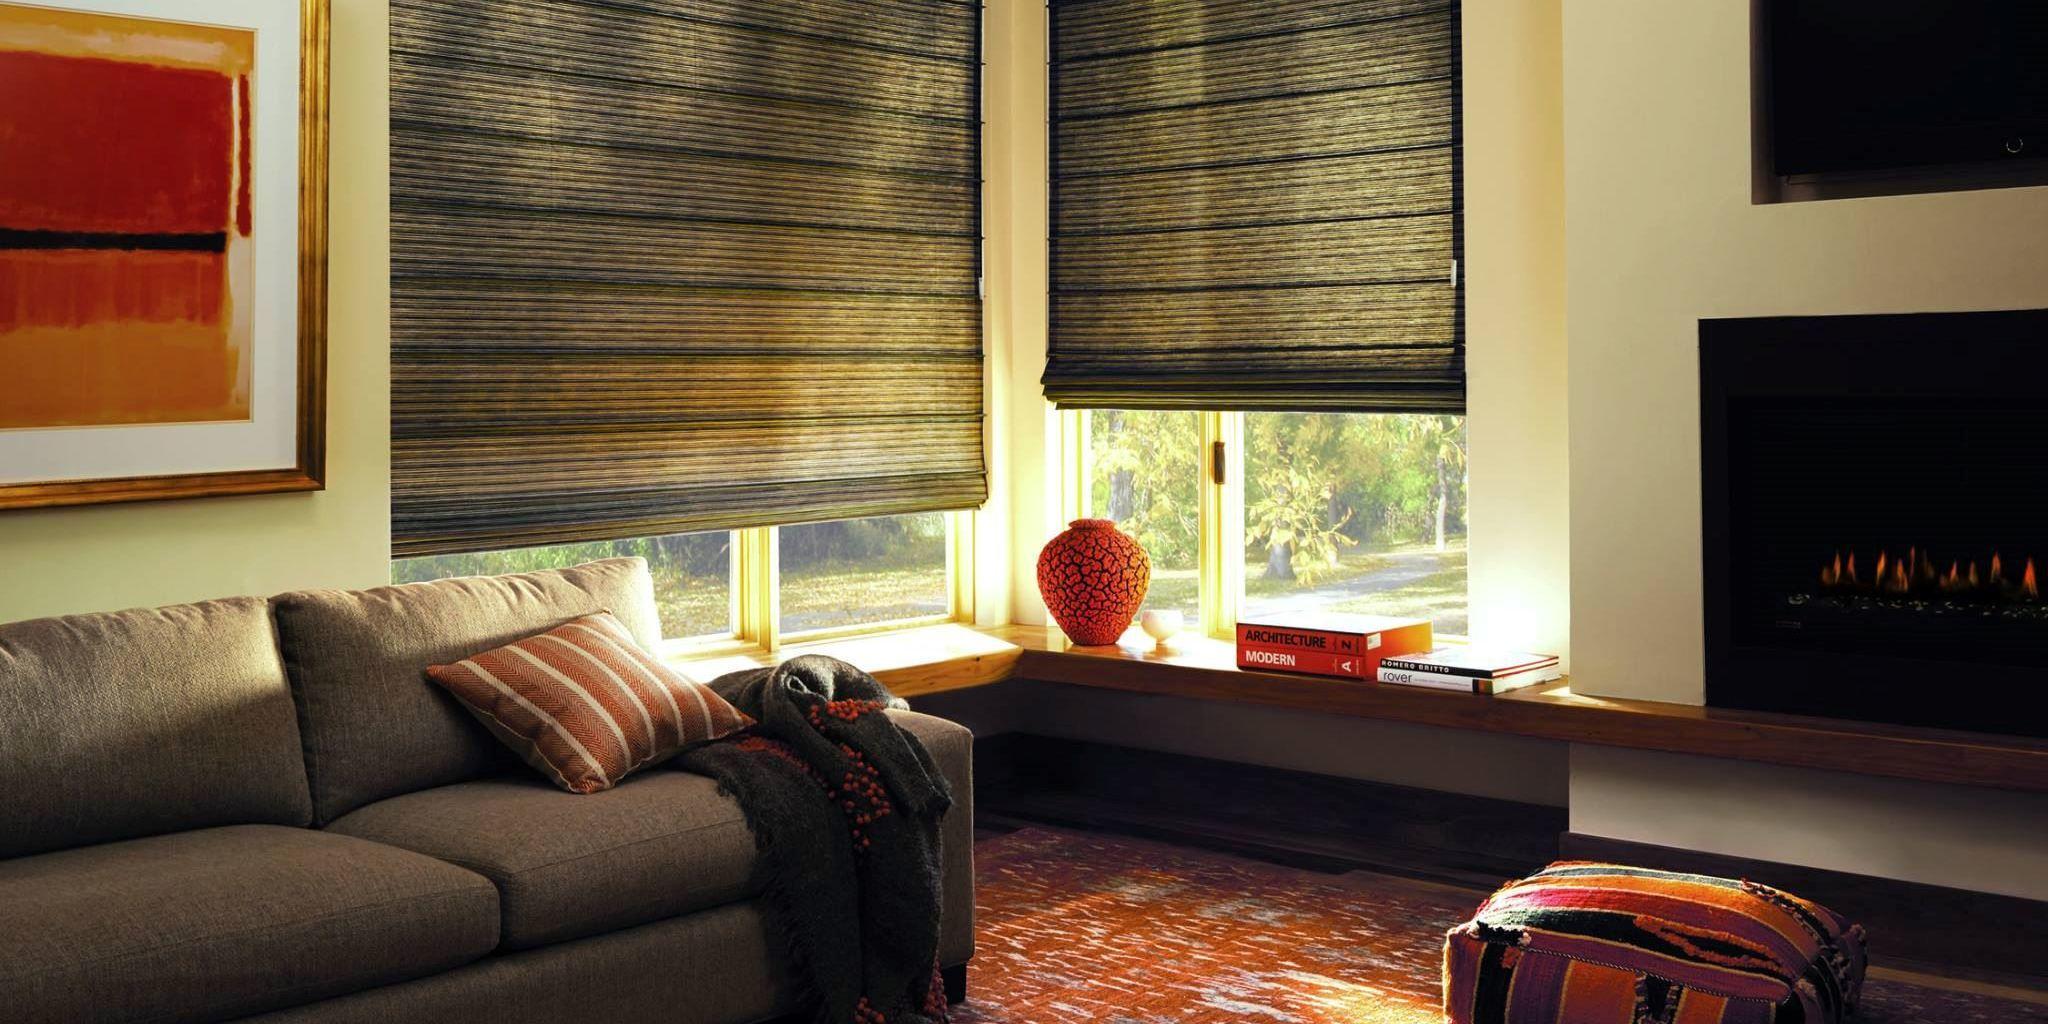 blinds manuals treatments december window solera soft in carousel shades layla douglas roman repair hunter white